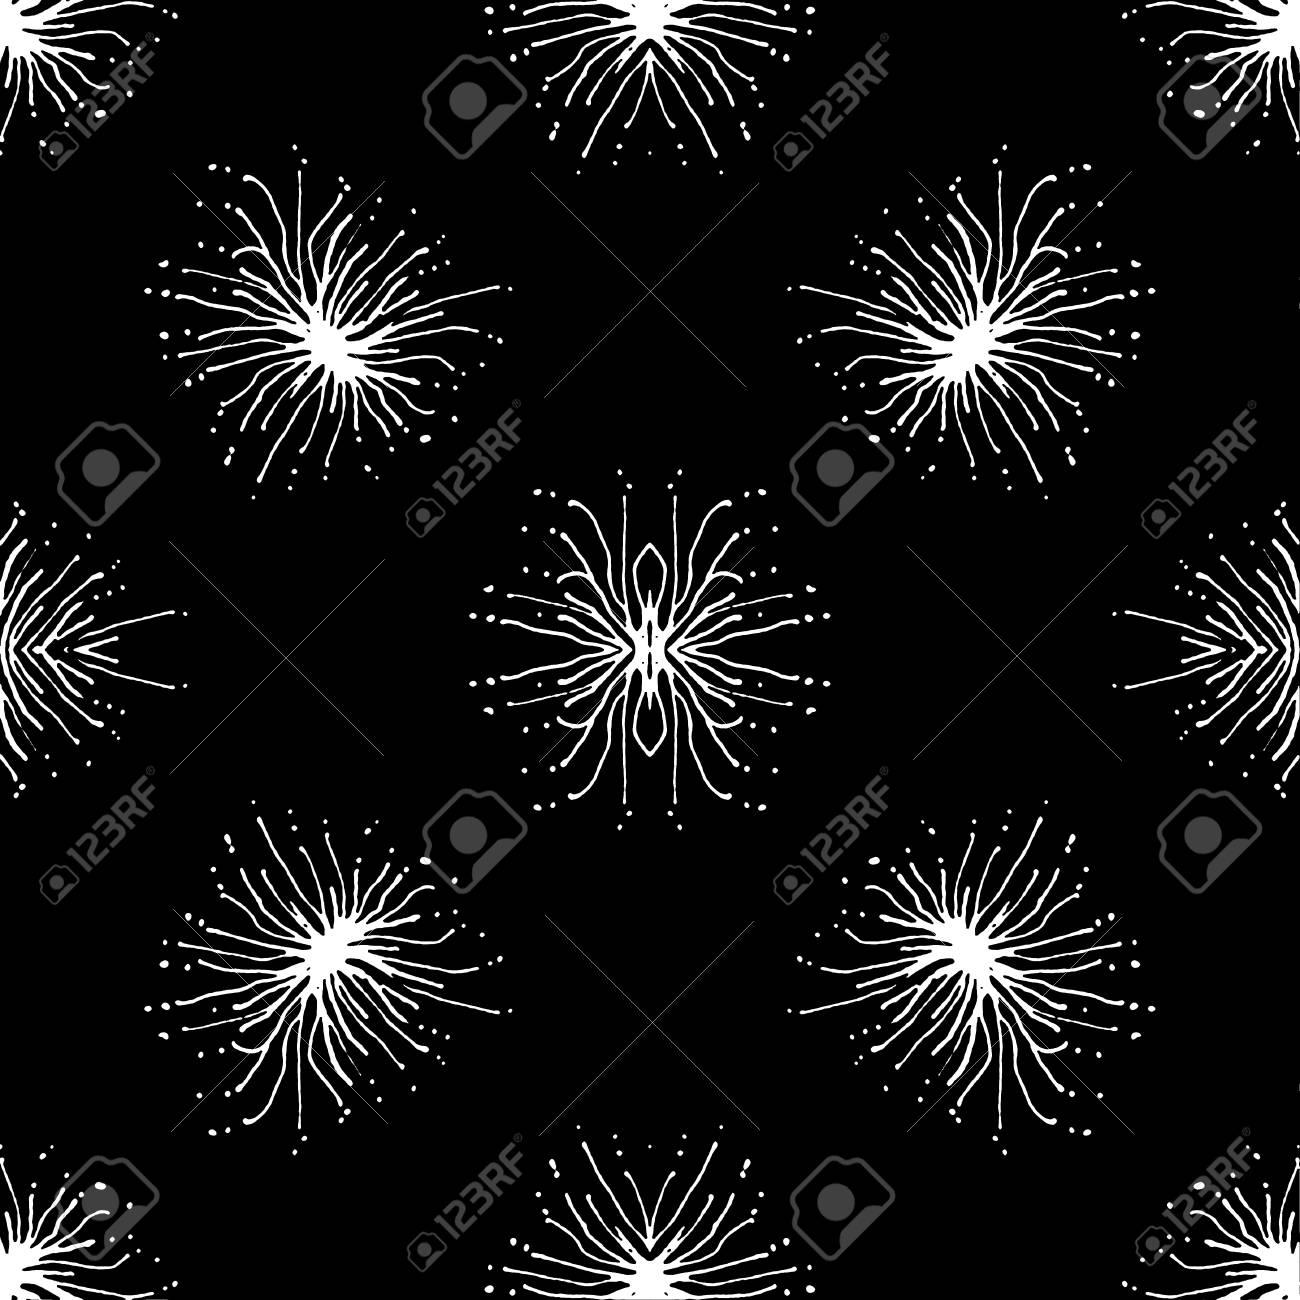 Hand draw radial shape stars motif black and white seamless pattern